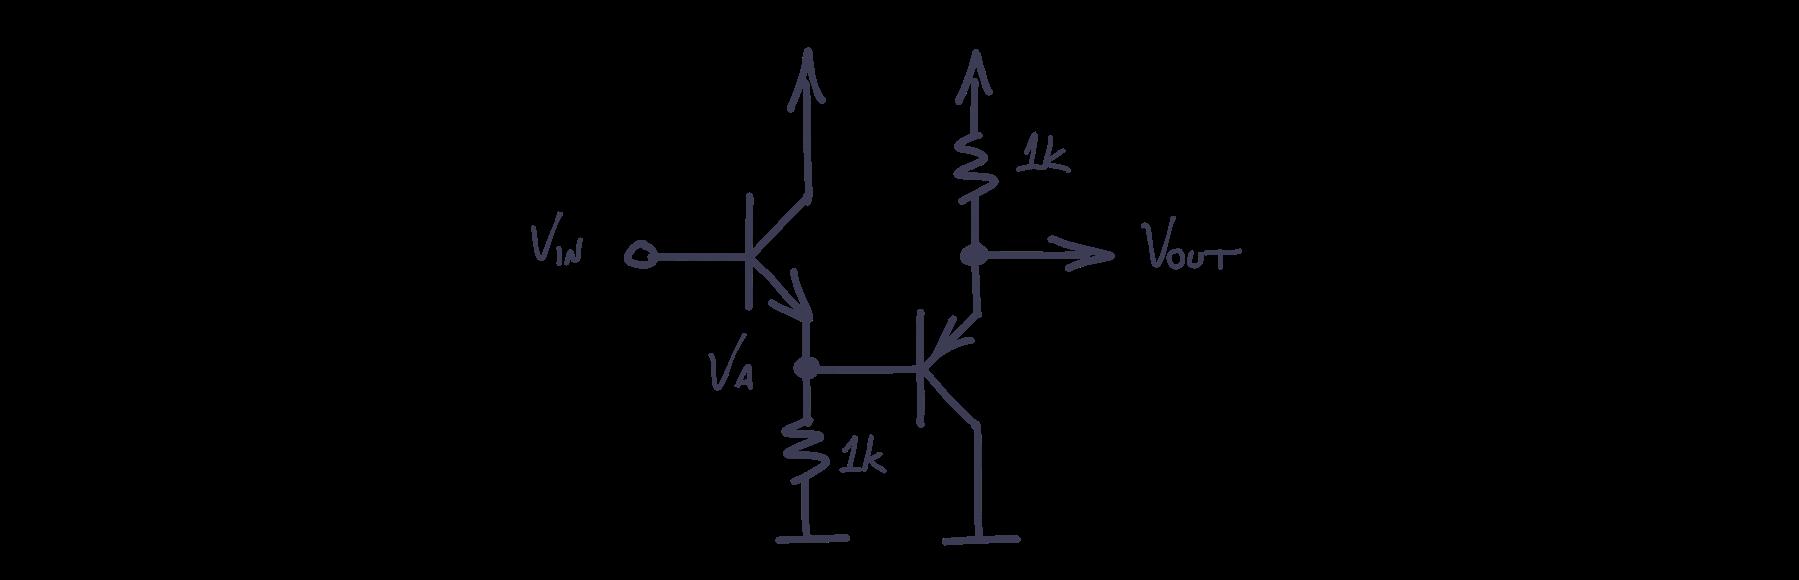 components_bjt-cfp-01.png